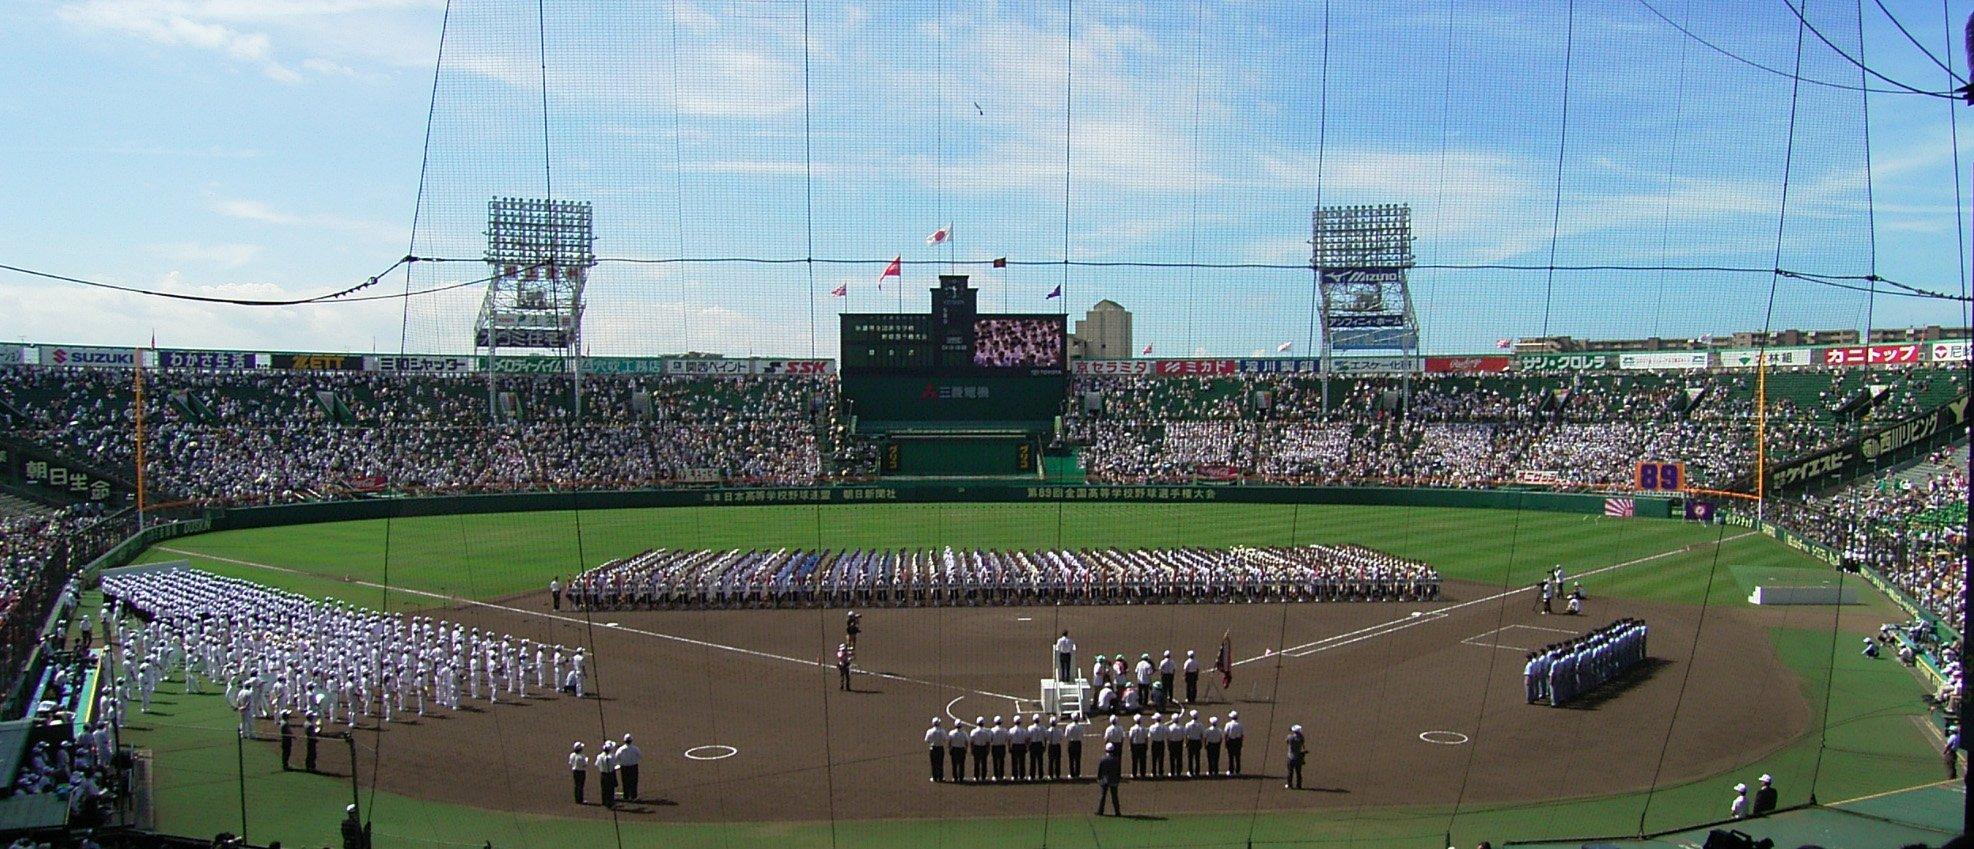 hanshin koshien stadium 2007 19 - 【夏の甲子園】 辛かったけど、負けたけど…幸せだった!負けた野球少年らの熱いメッセージまとめ